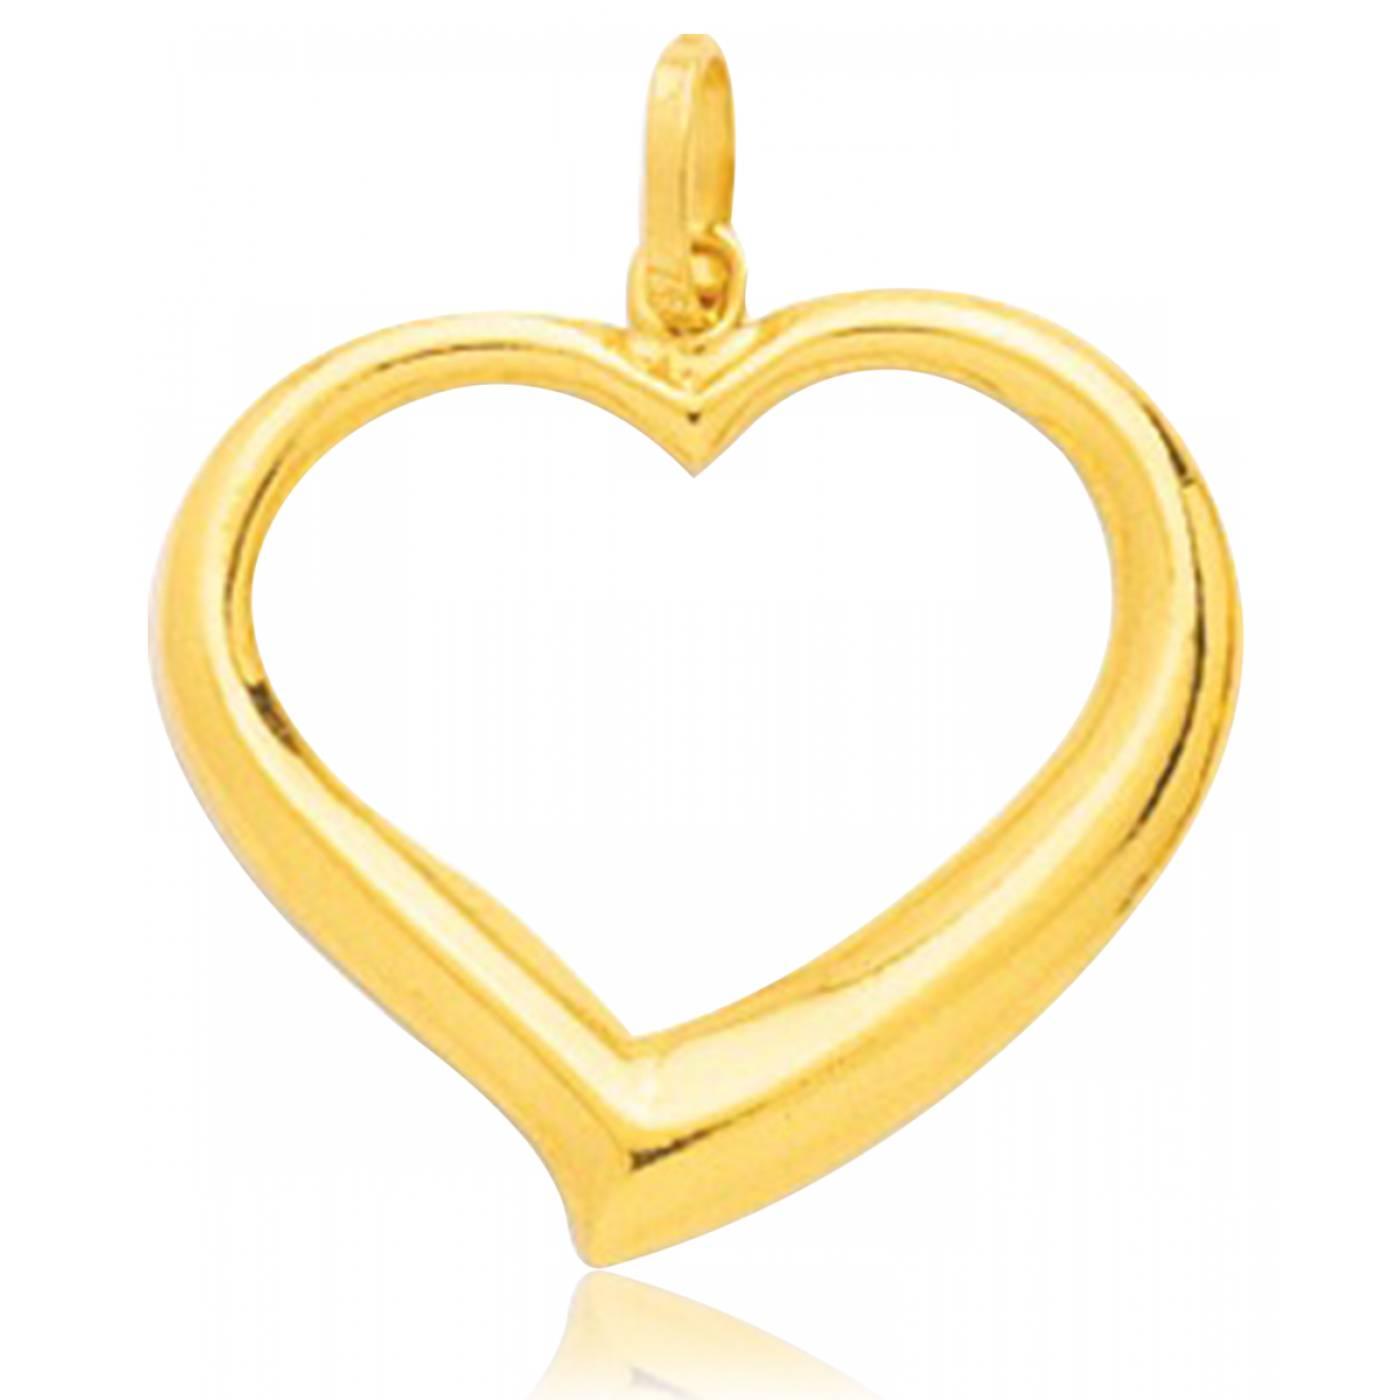 pendentif coeur homme femme cupidon or jaune 9 carats jaune murat paris. Black Bedroom Furniture Sets. Home Design Ideas